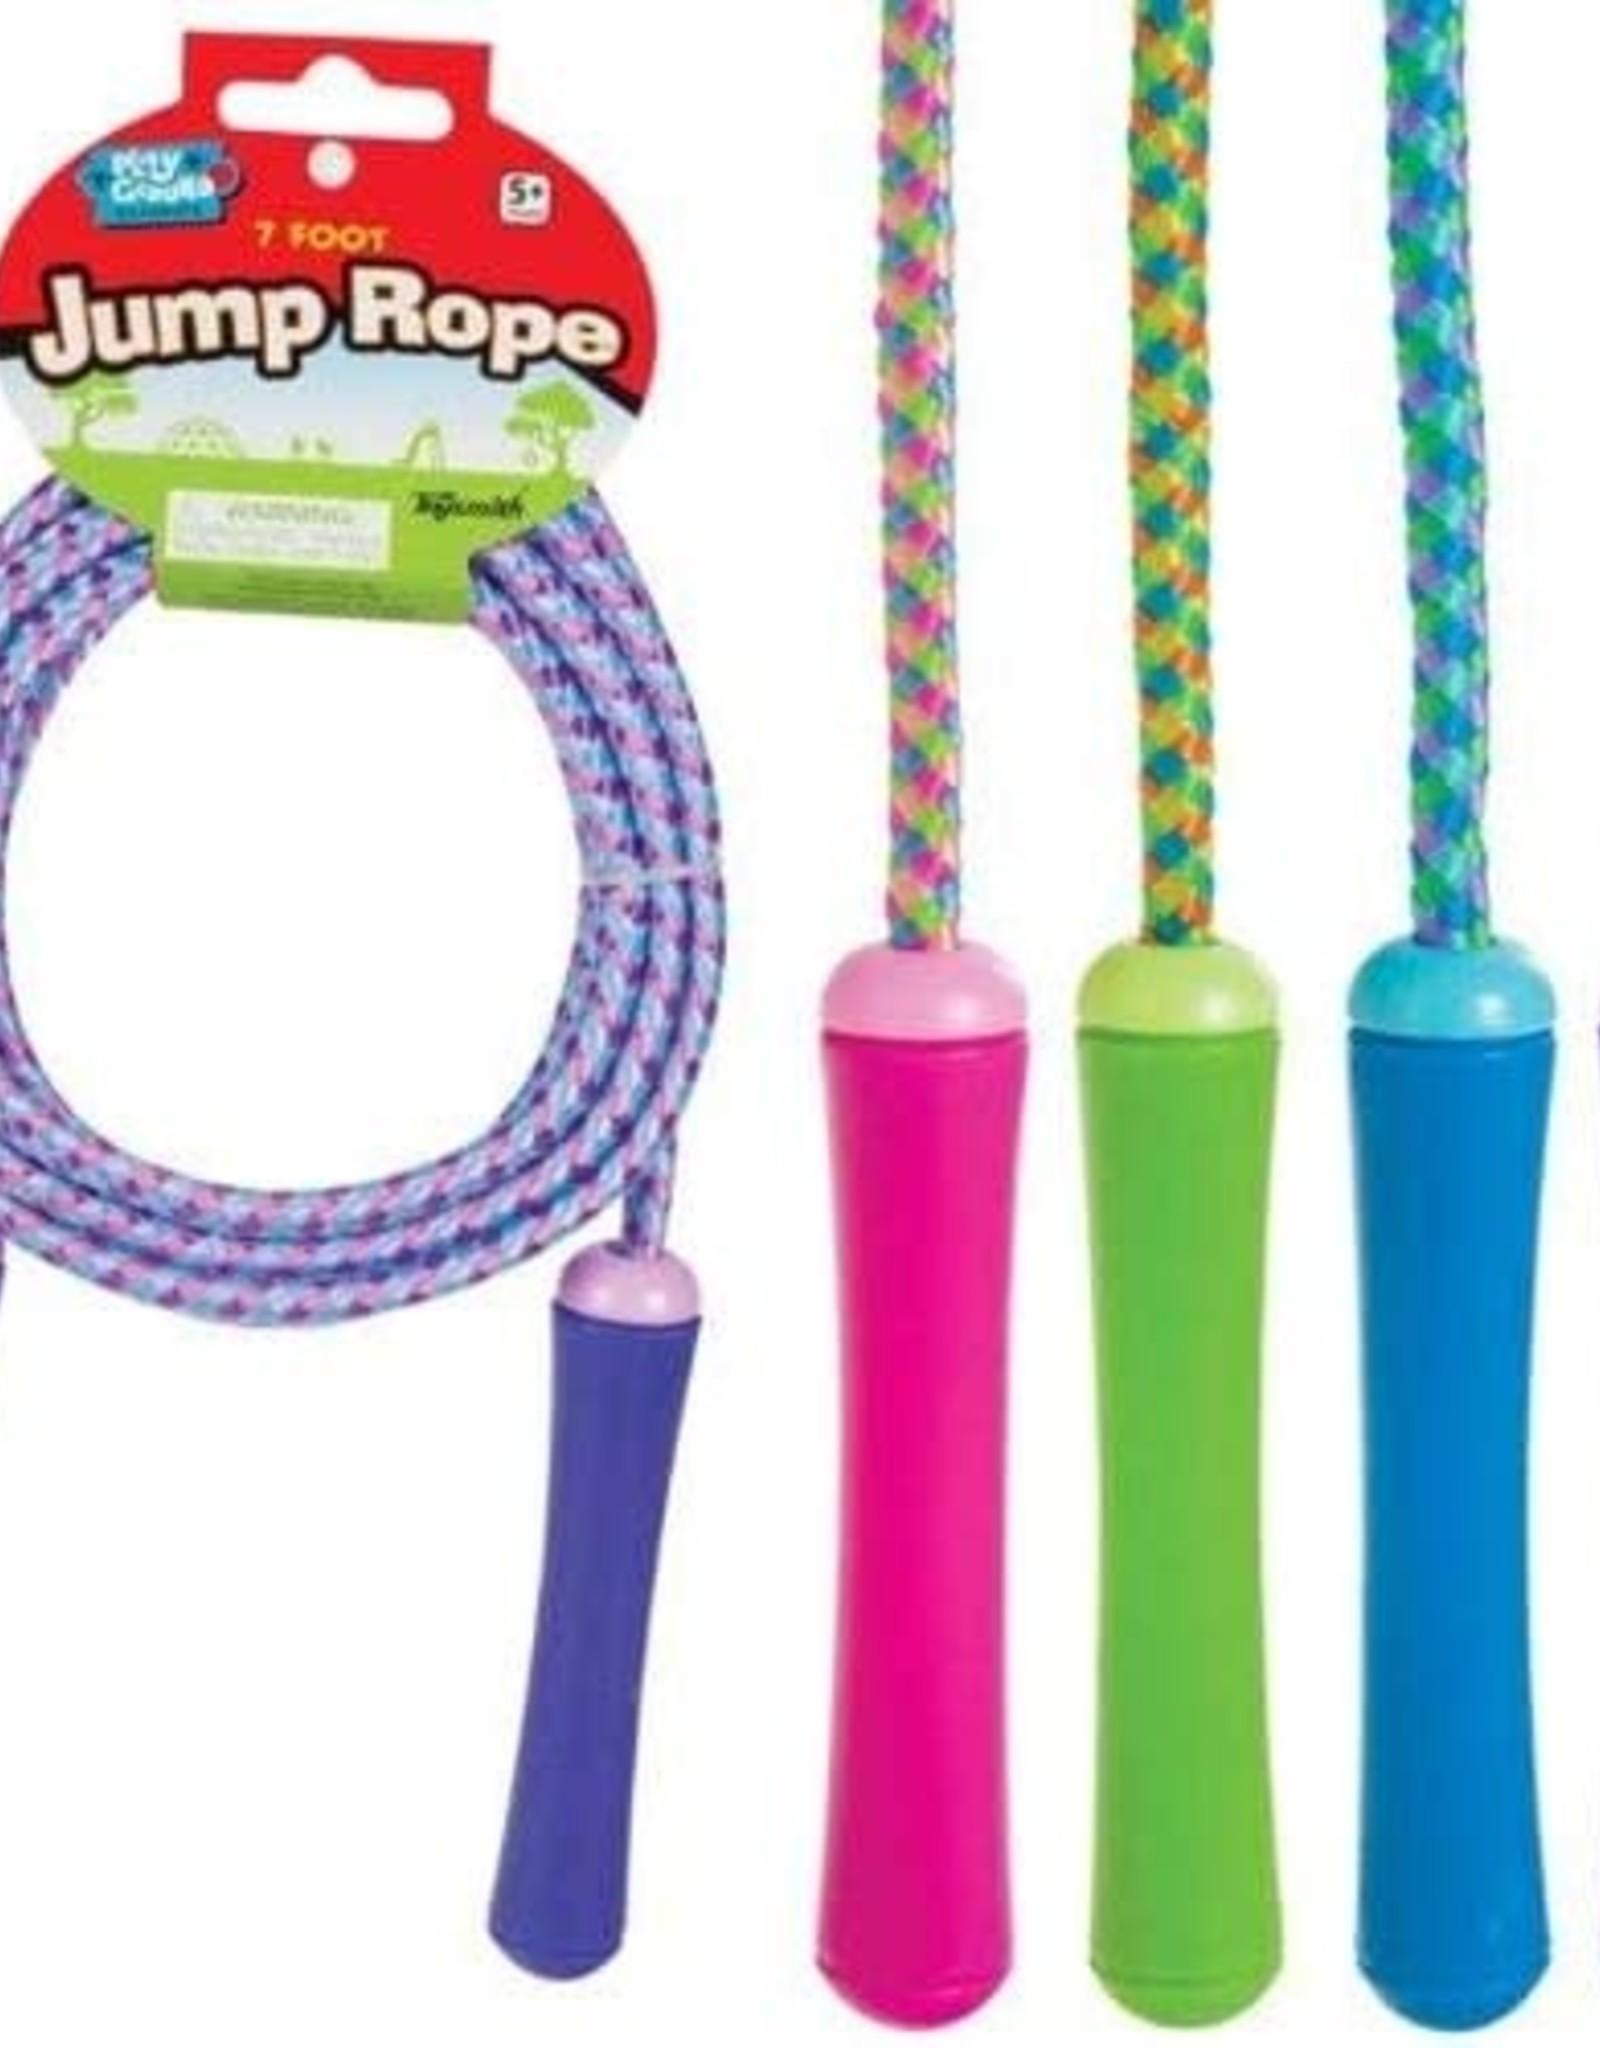 Toysmith 7 Ft Jump Rope